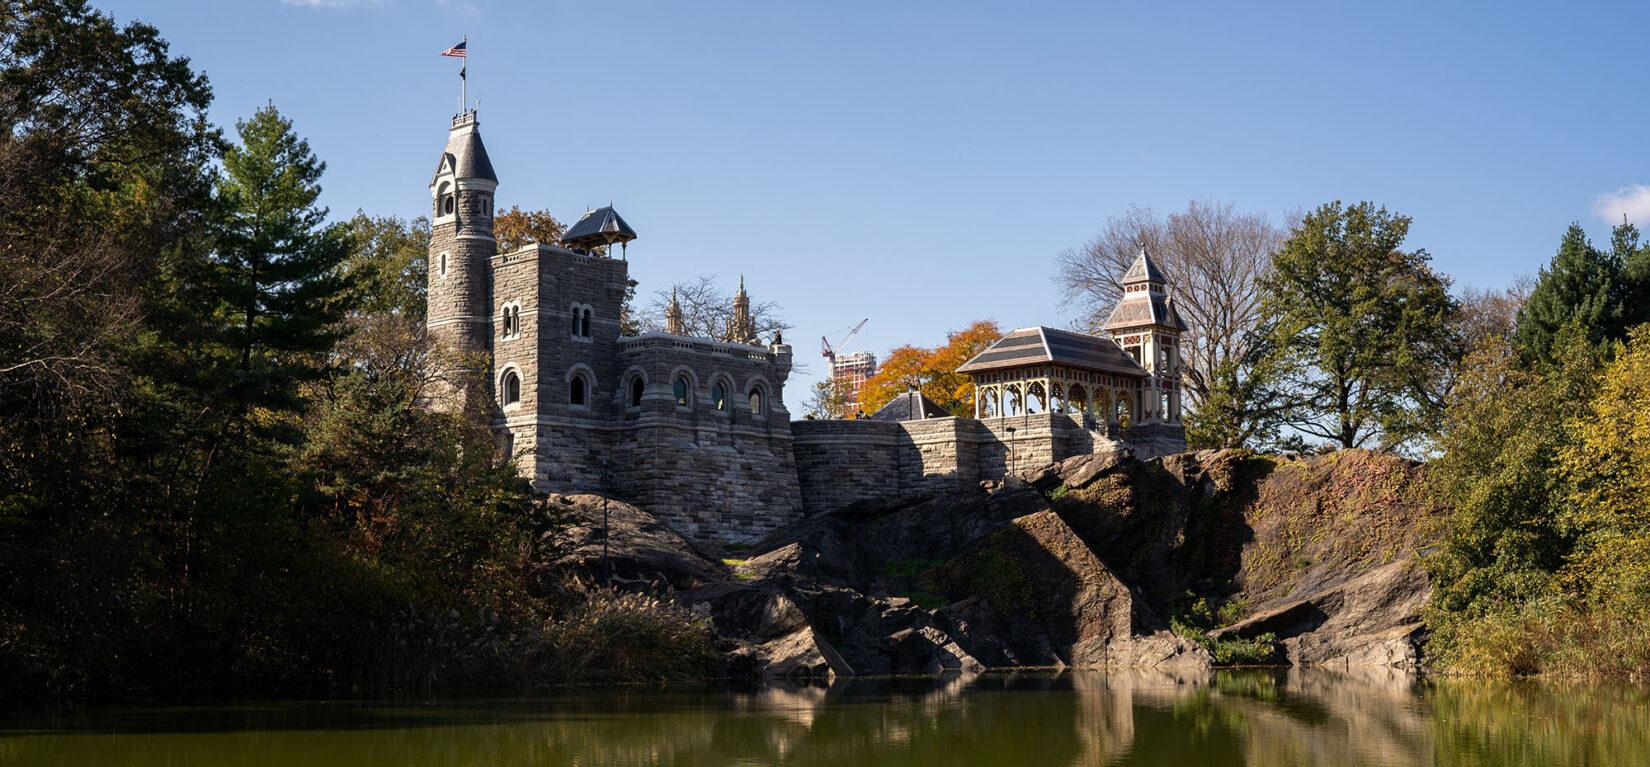 Belvedere Castle 20191106 09500